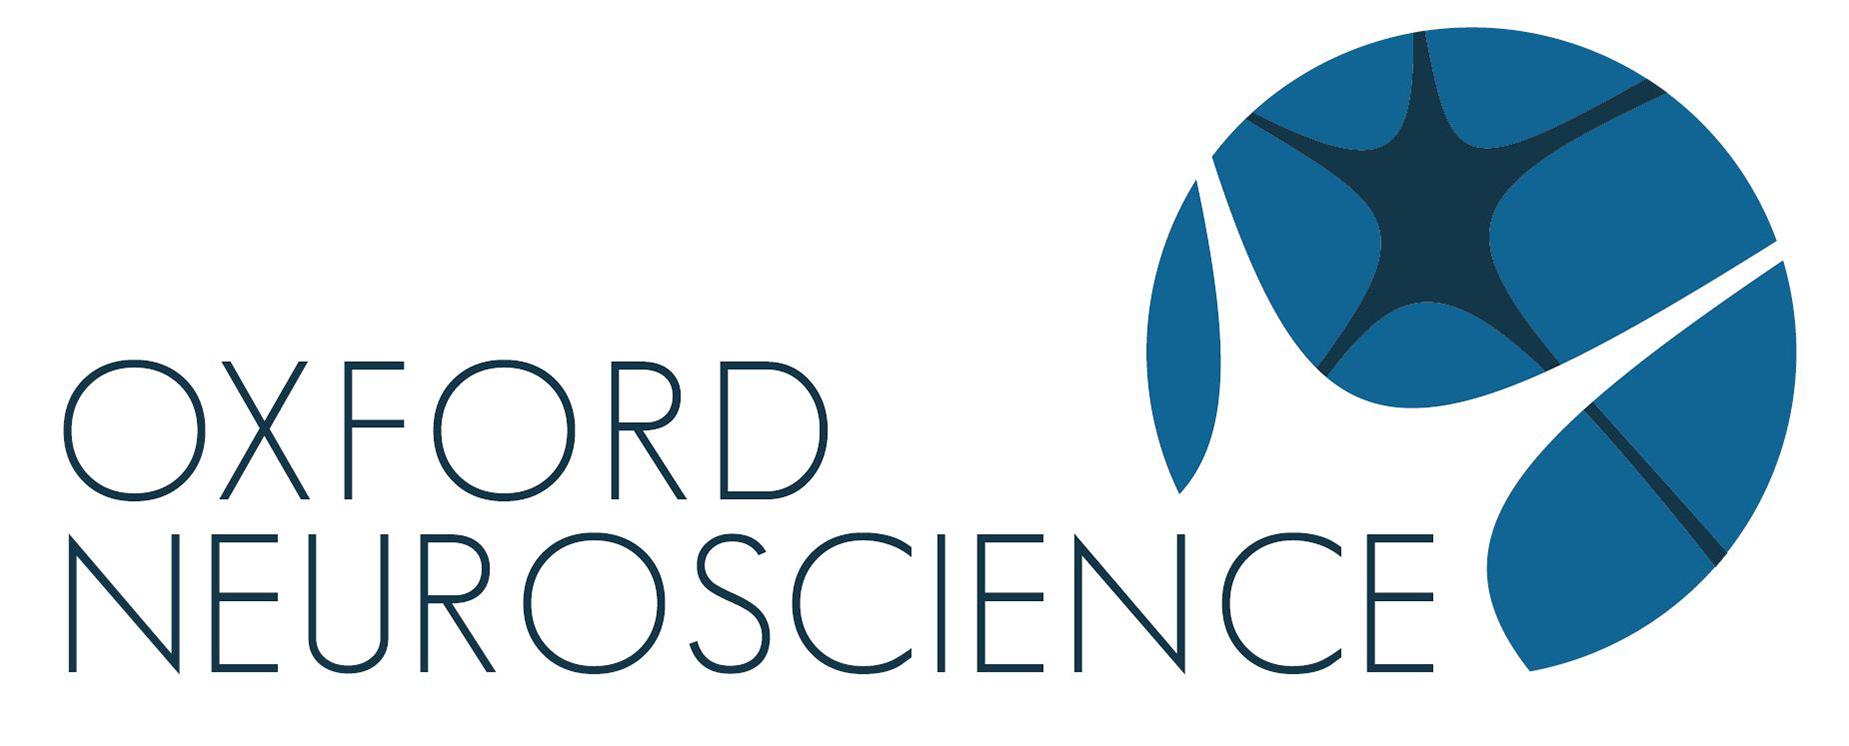 Oxford Neuroscience Logo